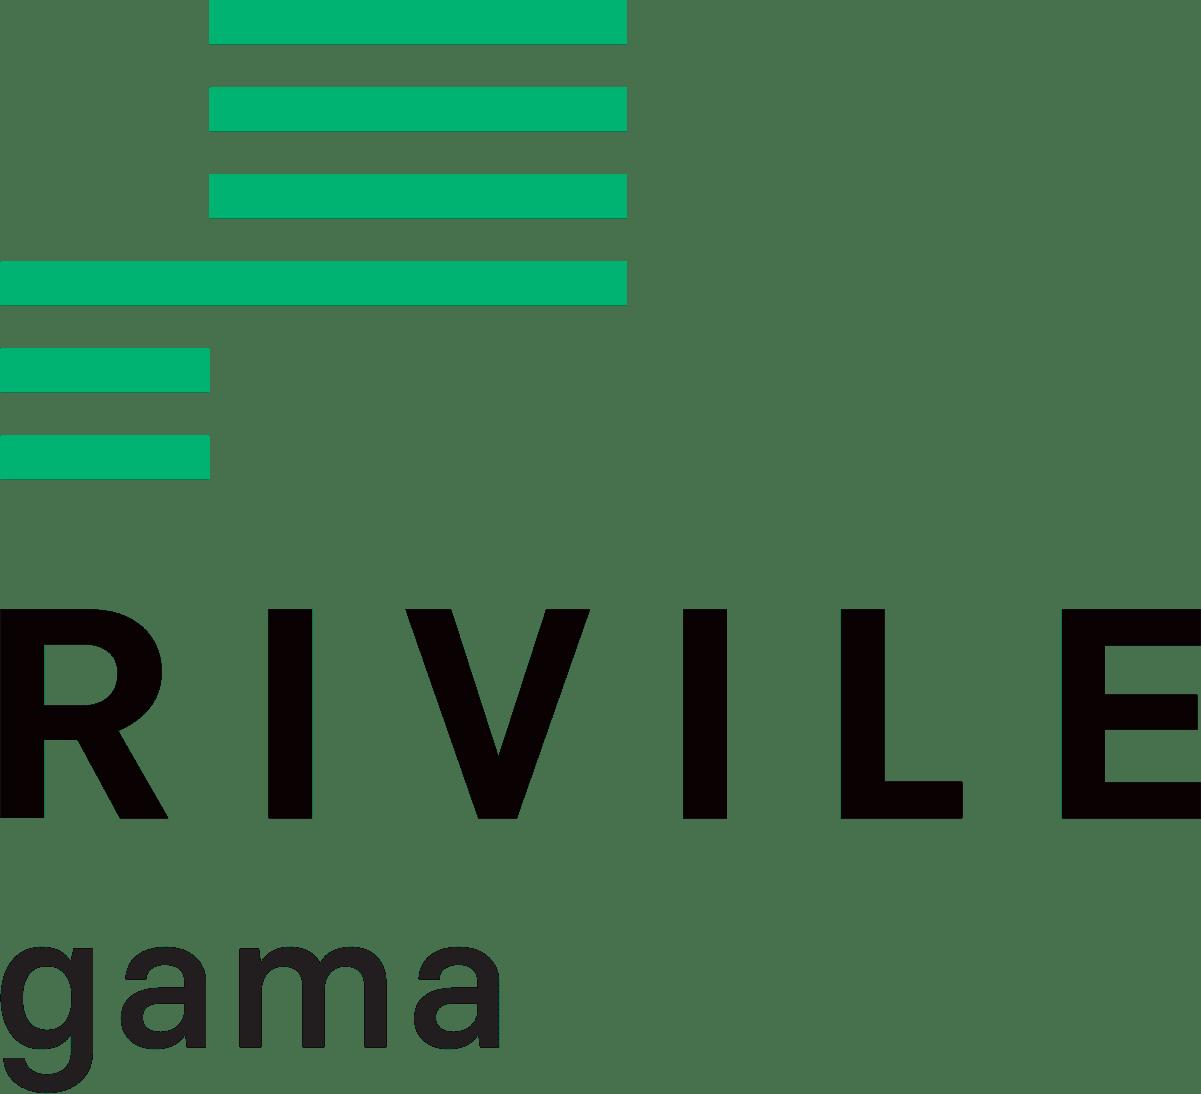 Rivile GAMA logotipas zalia juoda